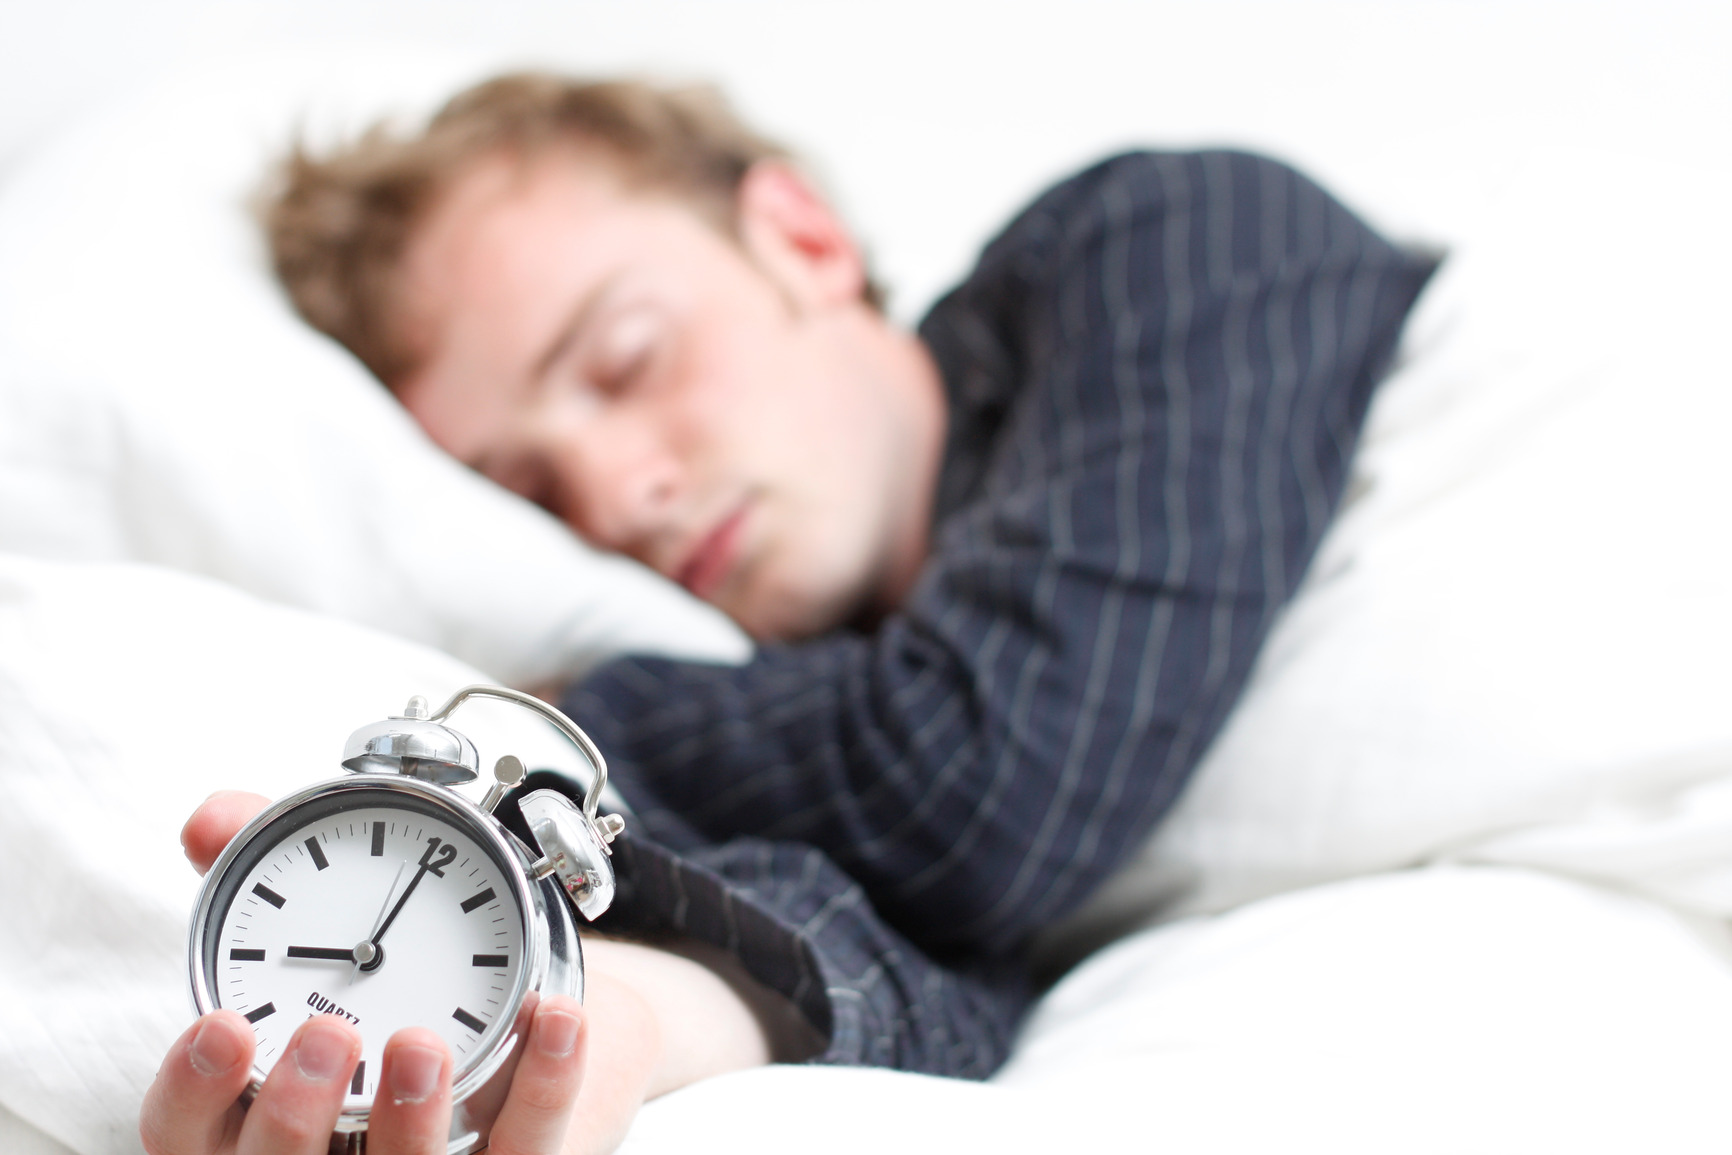 Cara Meningkatkan Daya Ingat dengan Tidur yang Cukup